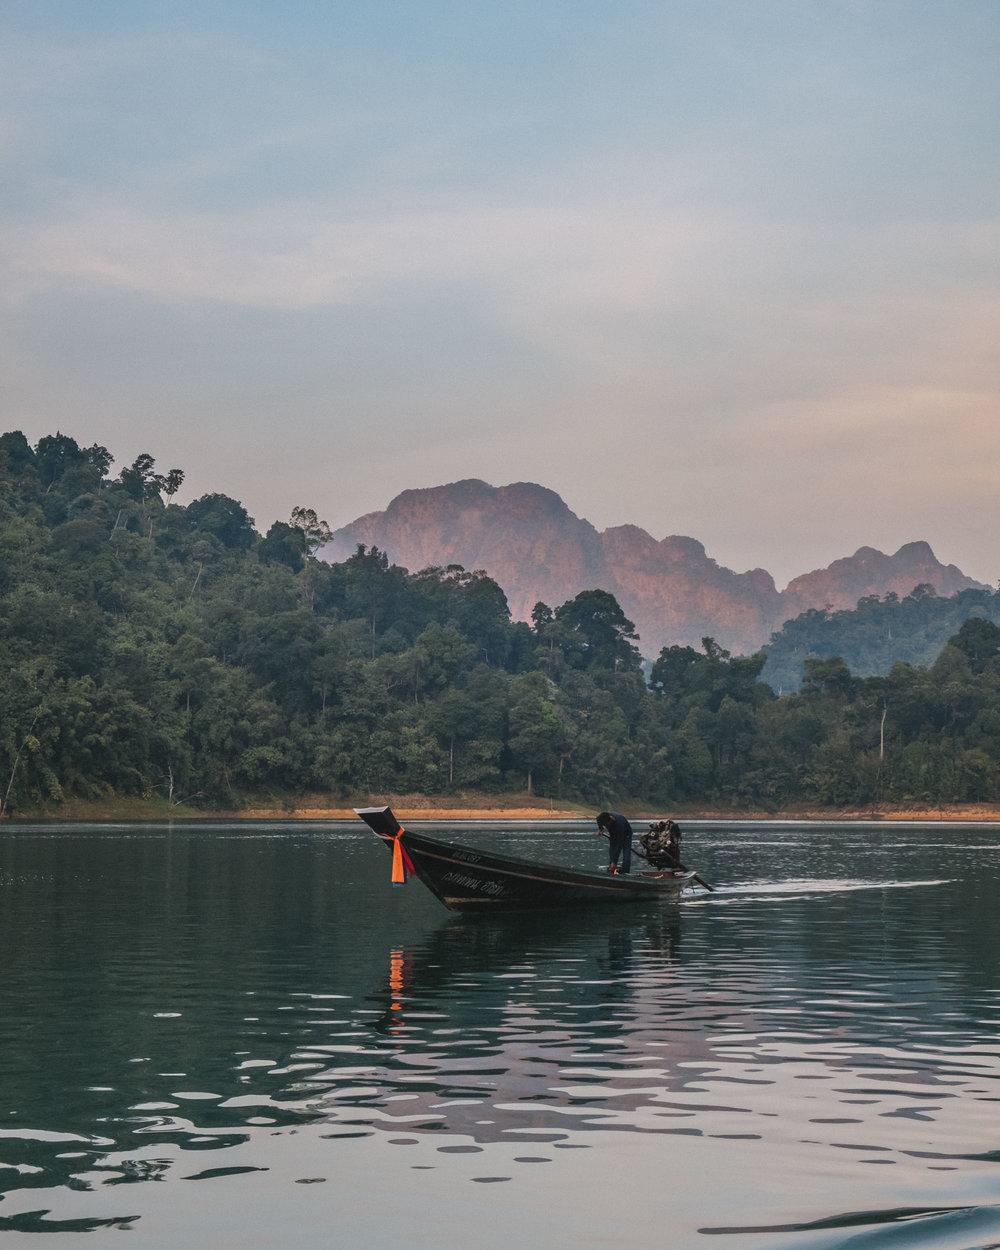 Thailand-20180306-002533.jpg